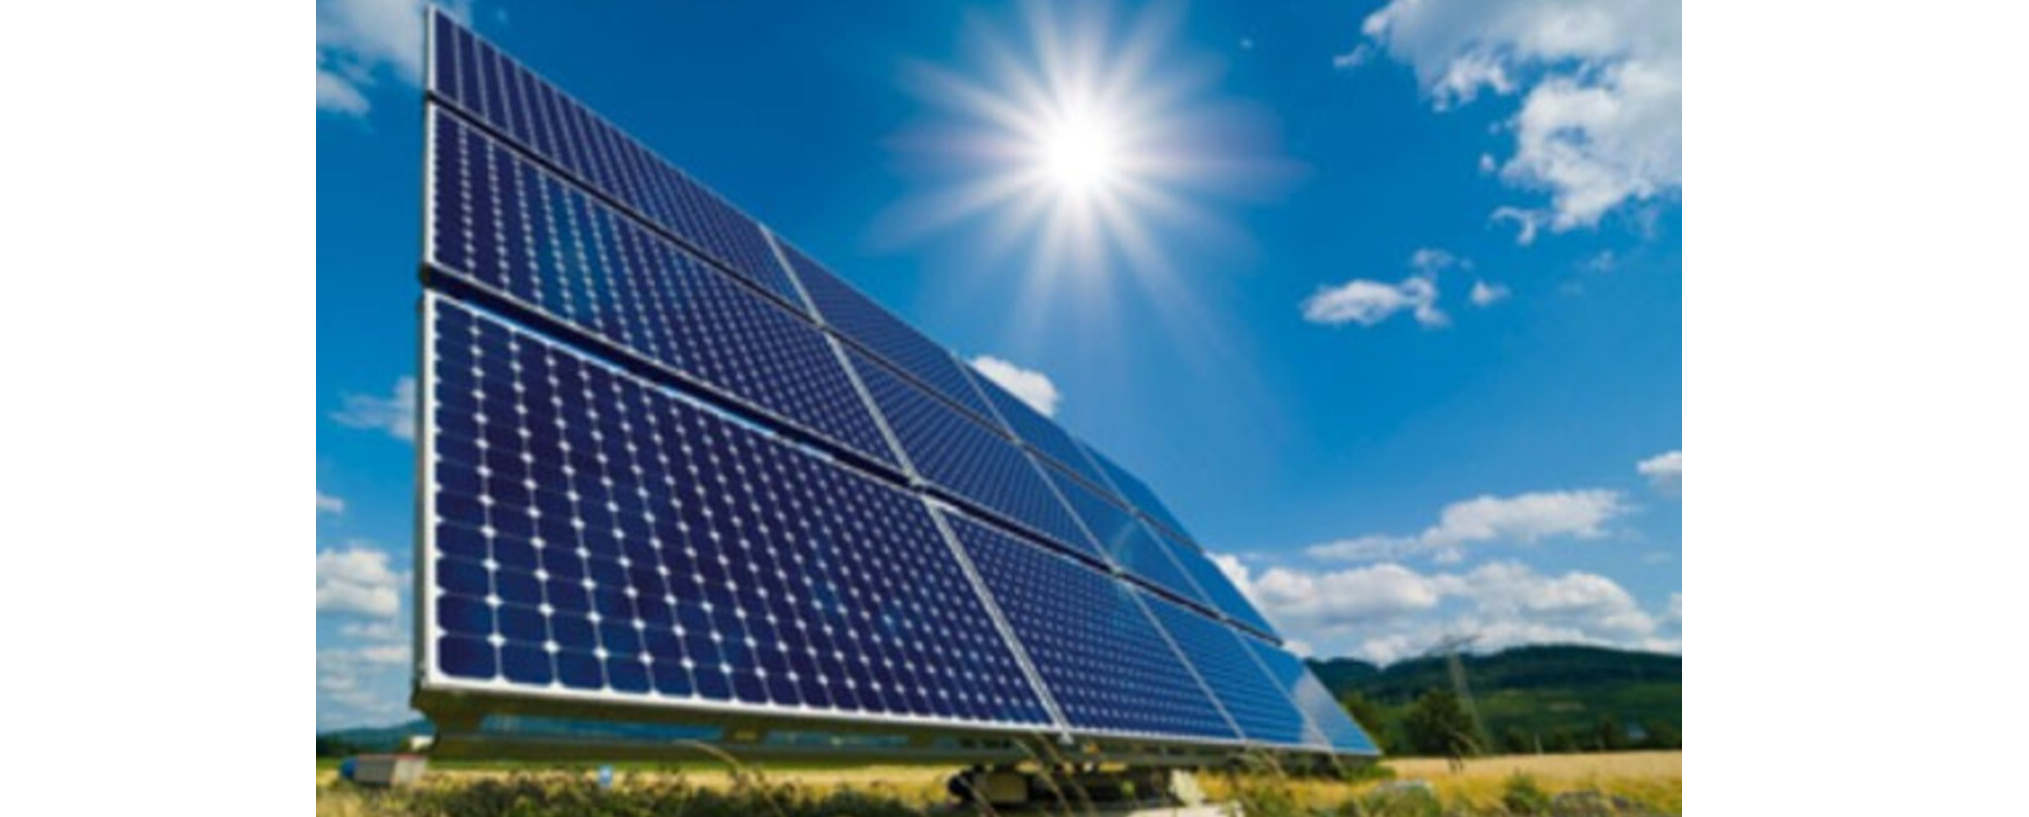 Seatcos Akshay Urja Shop - Solar Energy System Dealer in Amravati HO, Amravati